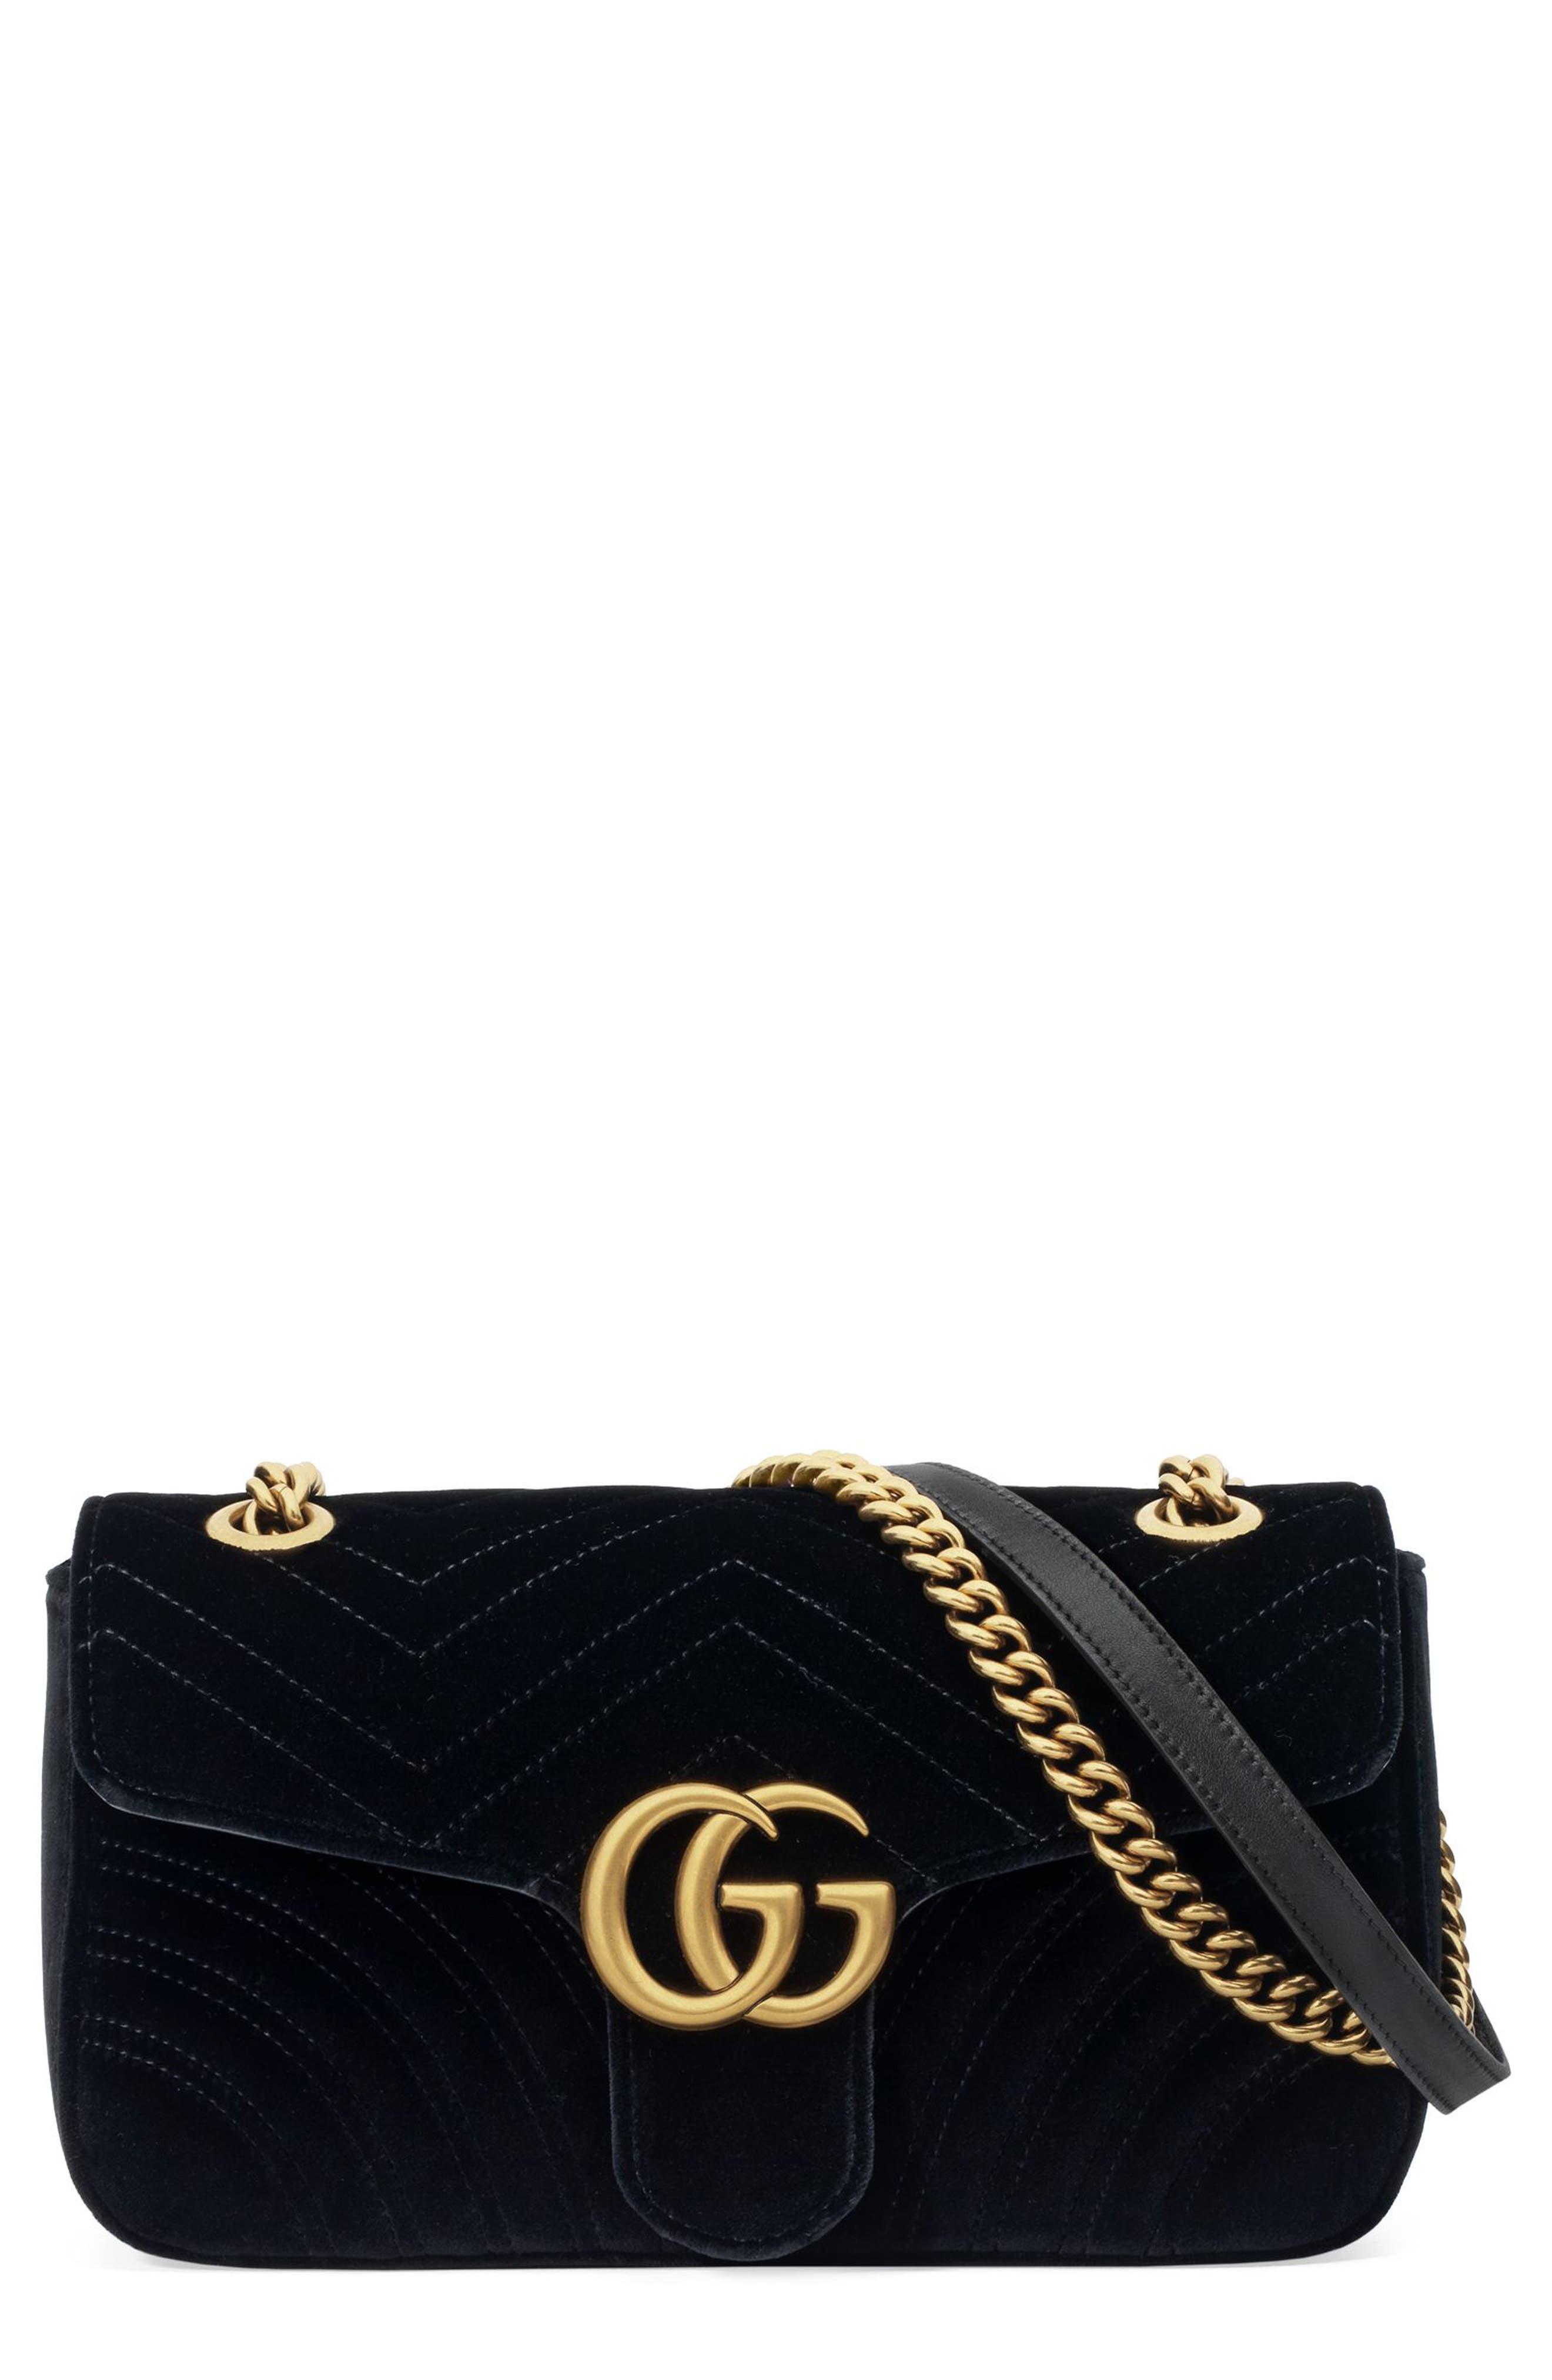 Medium GG Marmont 2.0 Matelassé Velvet Shoulder Bag,                         Main,                         color, NERO